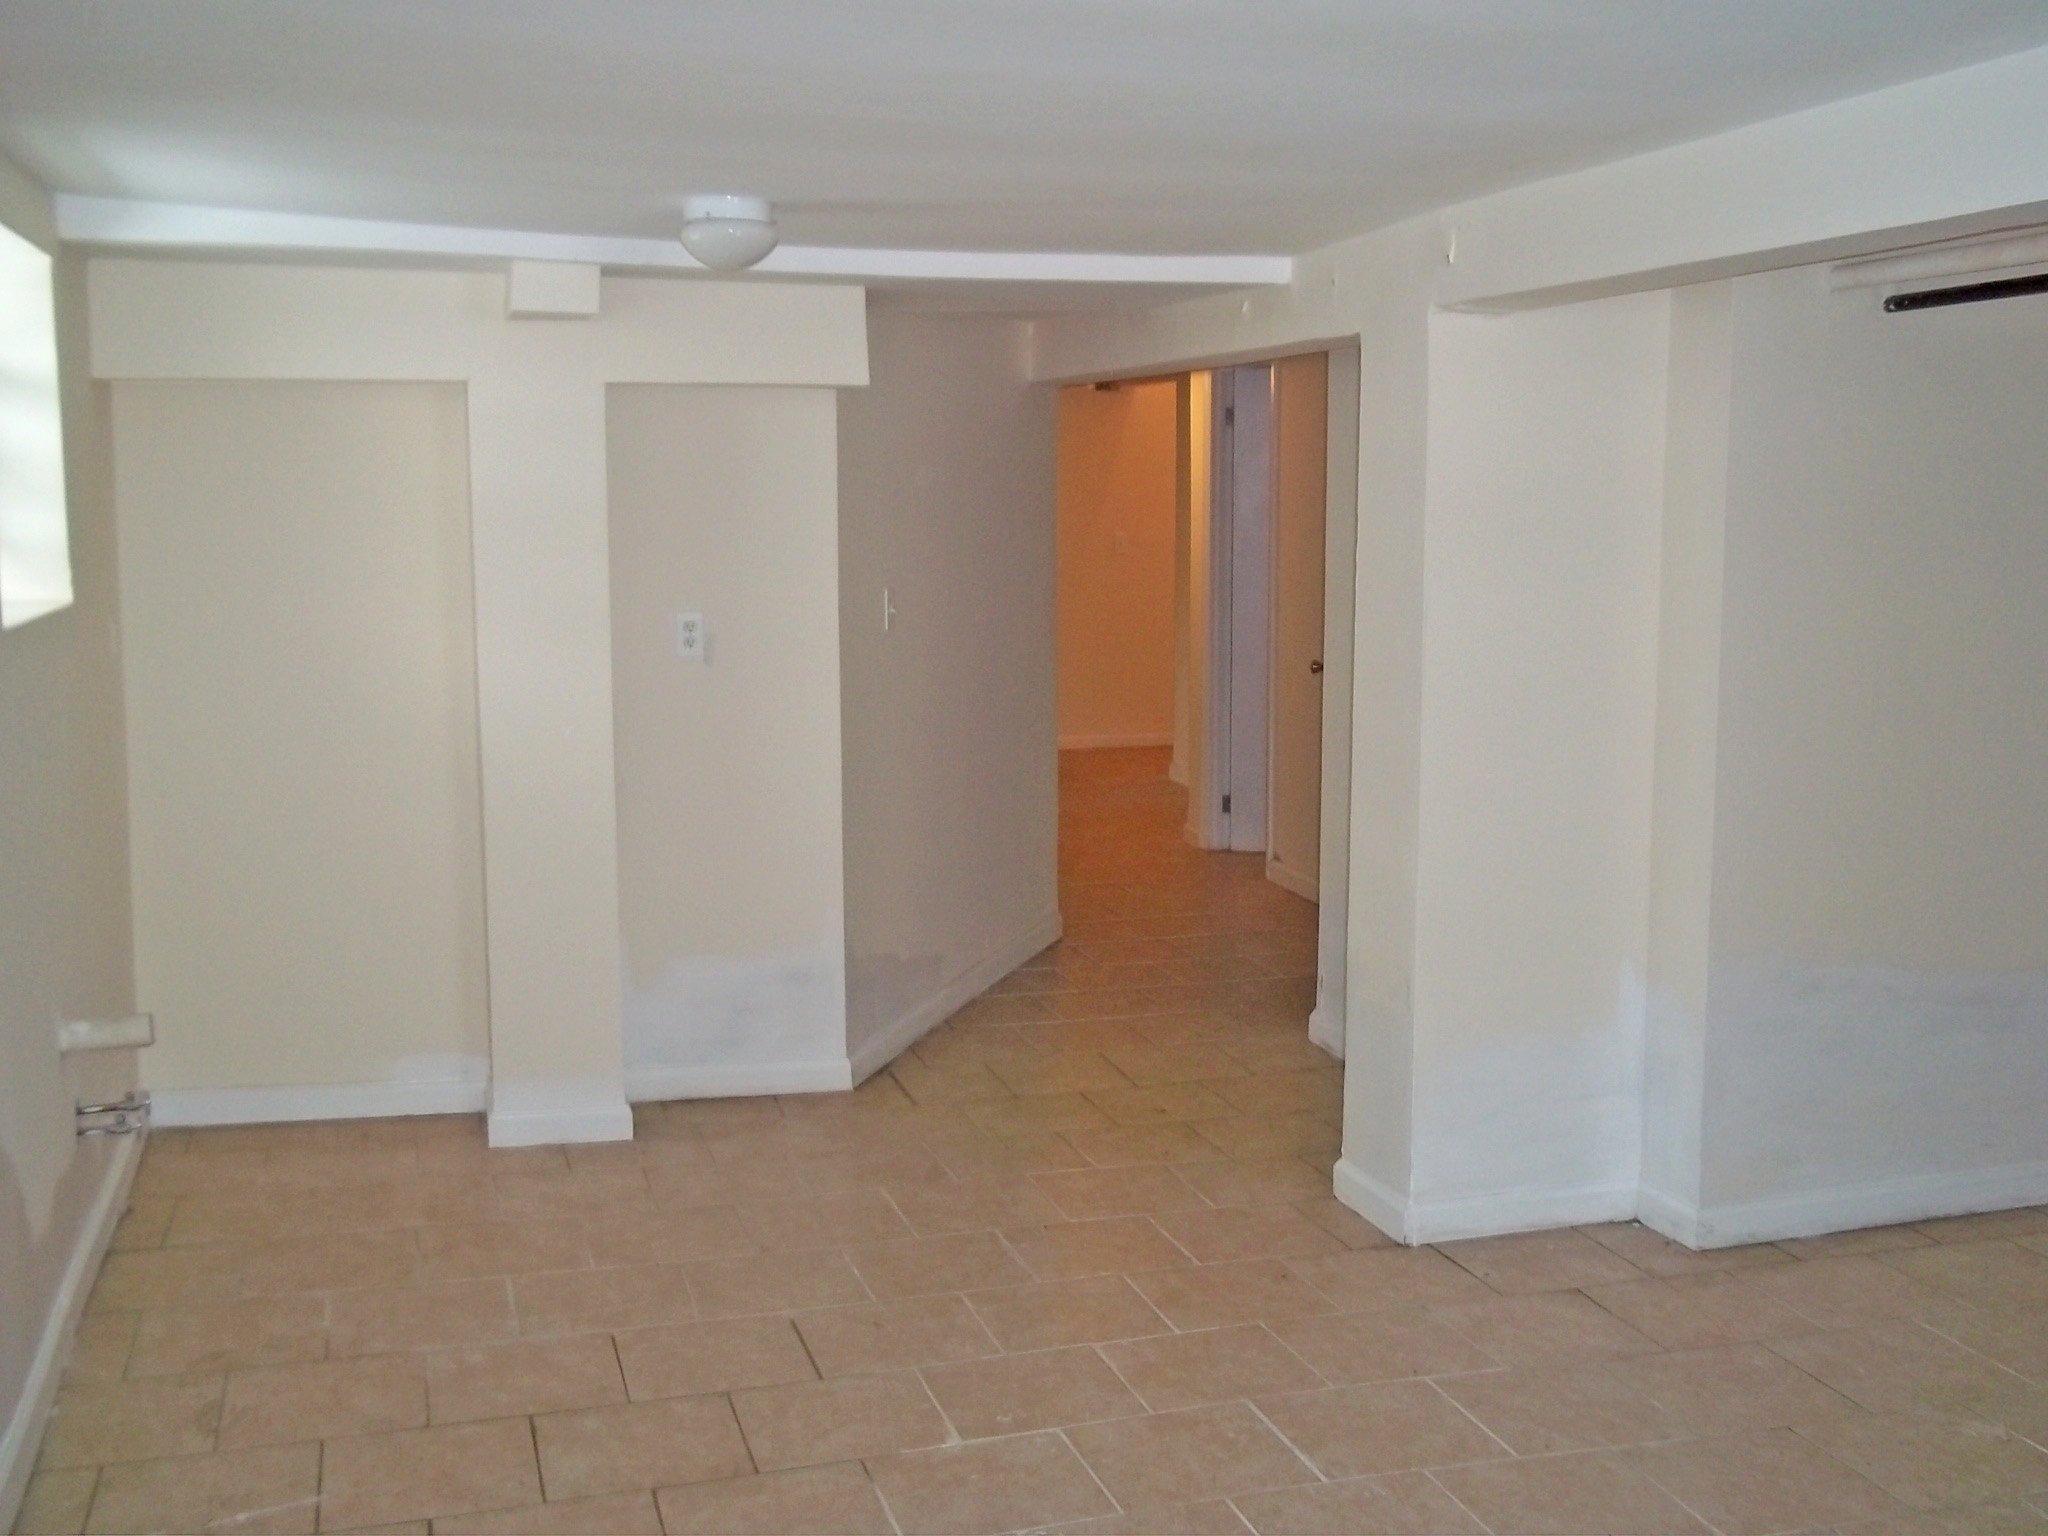 bedroom apartment queens craigslist tuforce 2 bedroom apartment for rent in queens bedroom apartment sale